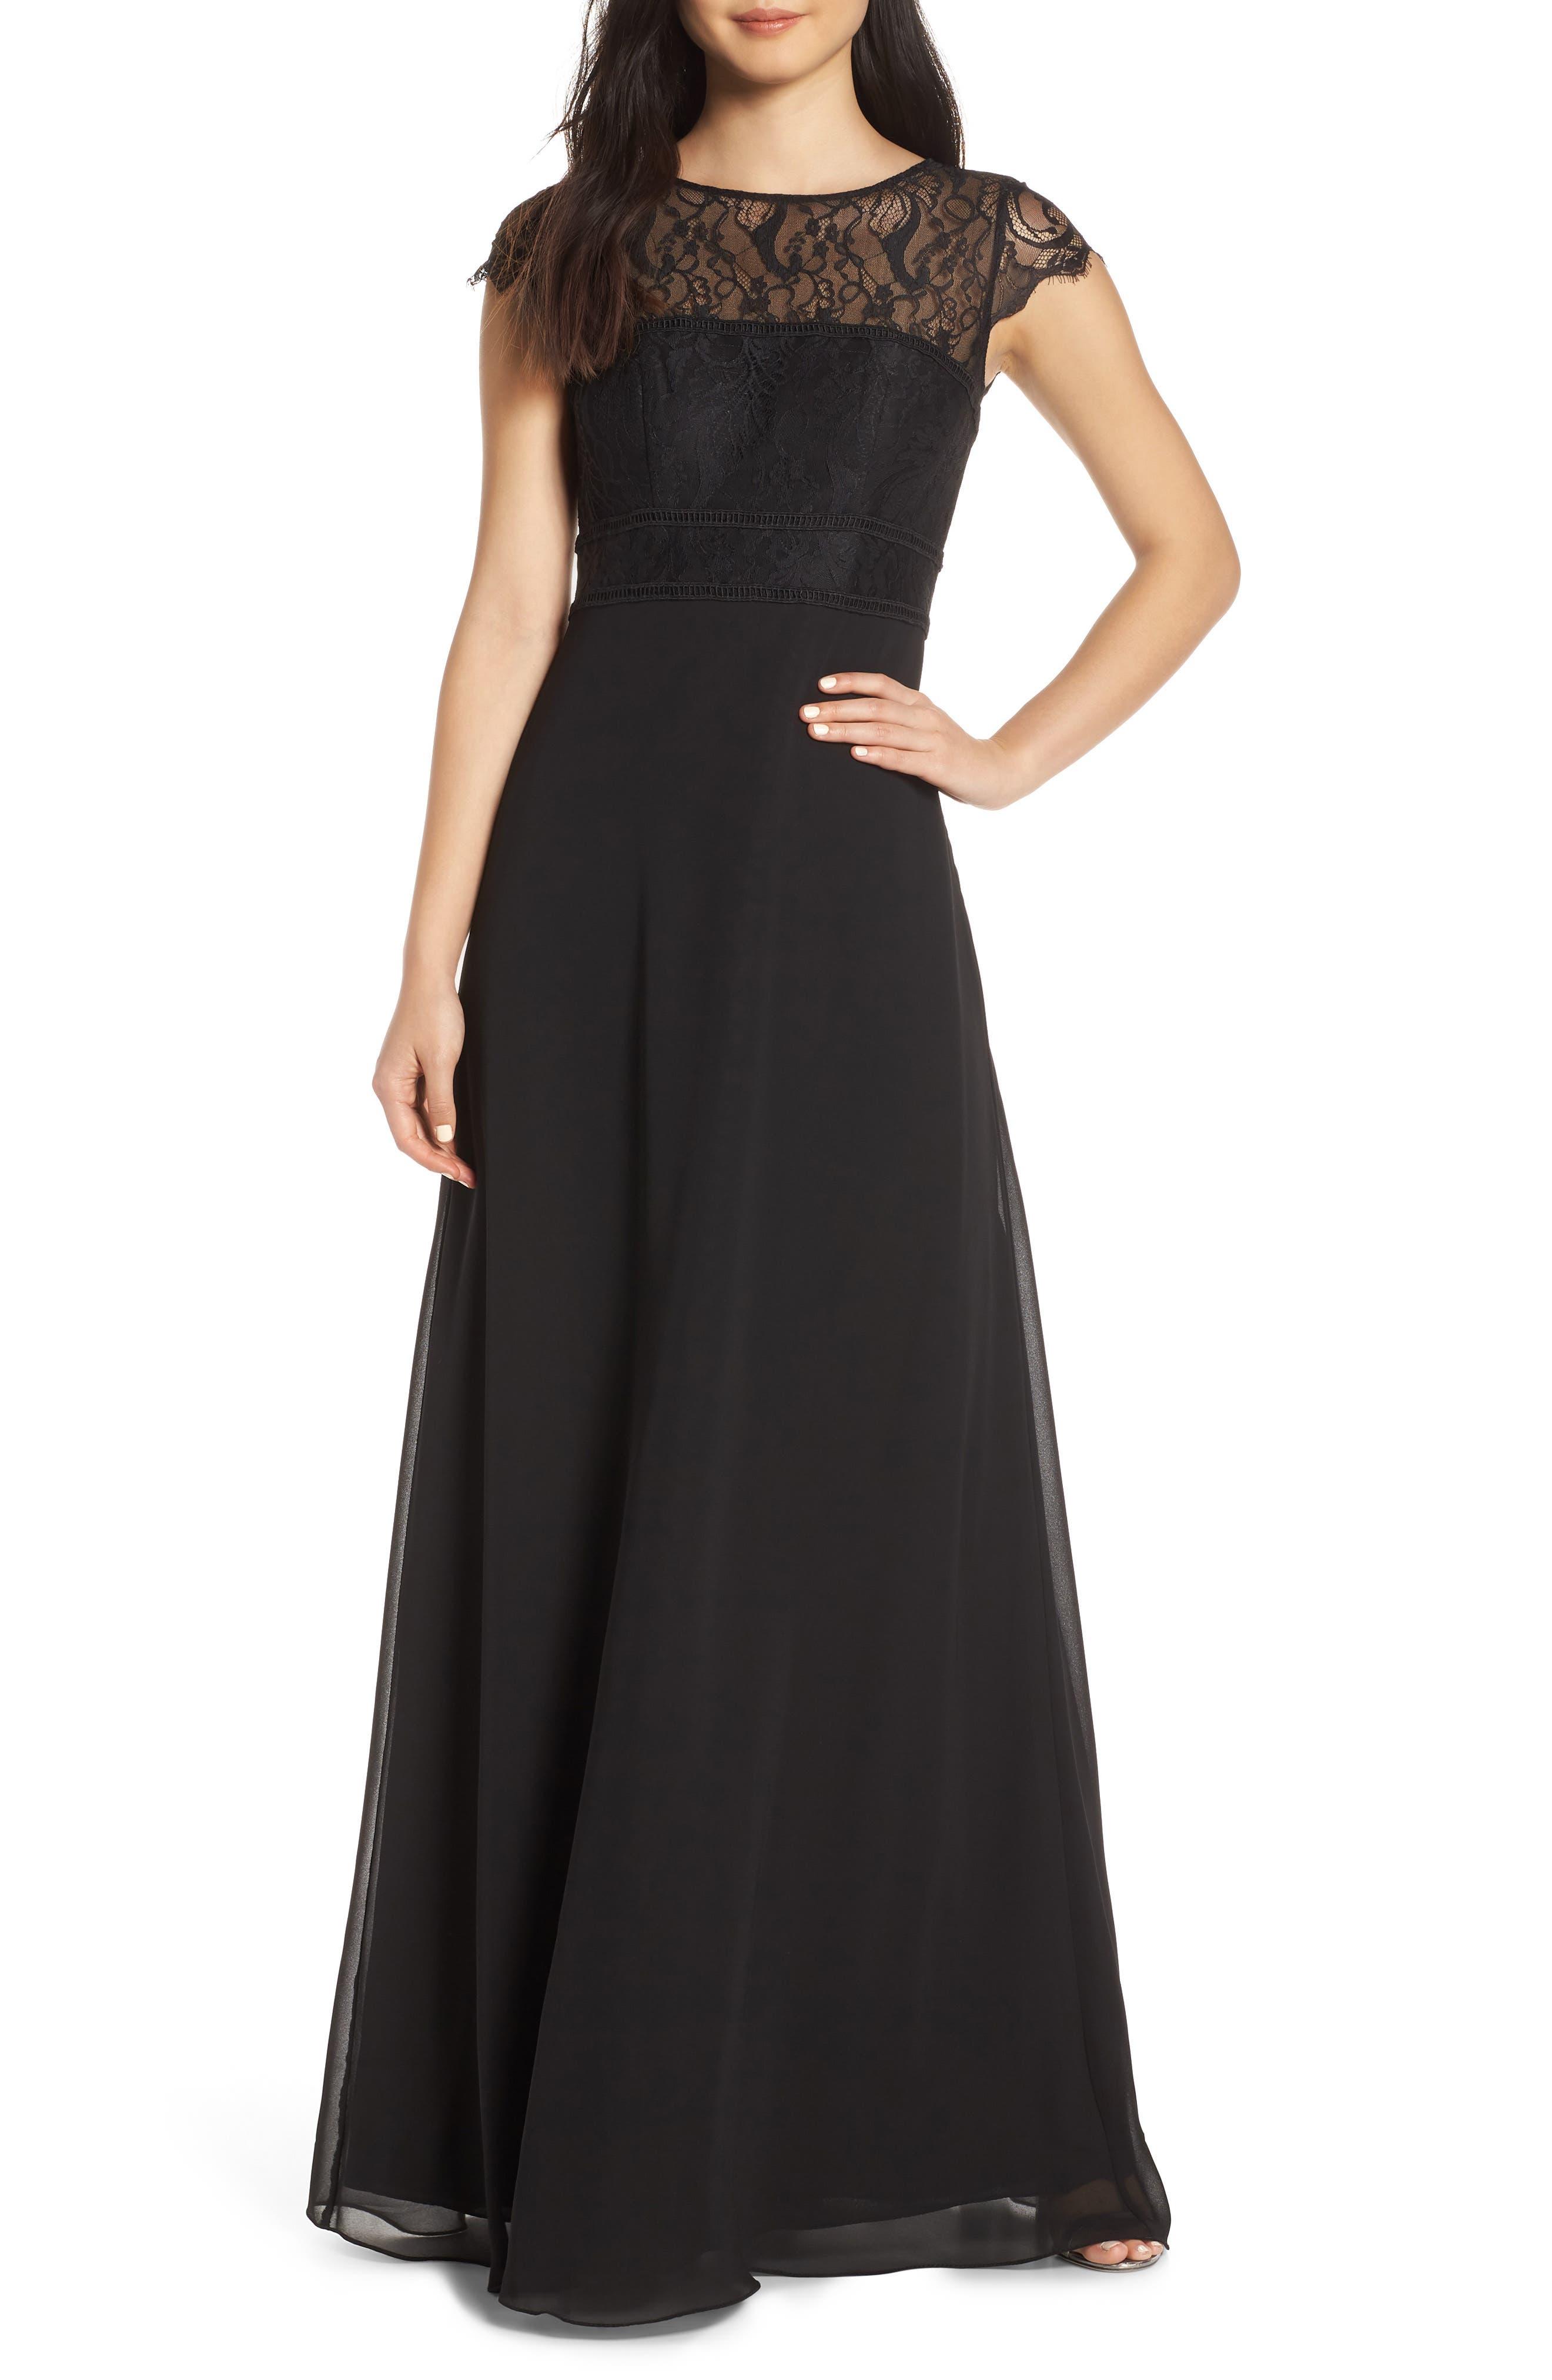 HAYLEY PAIGE OCCASIONS Lace Bodice Chiffon Evening Dress, Main, color, BLACK / BLACK